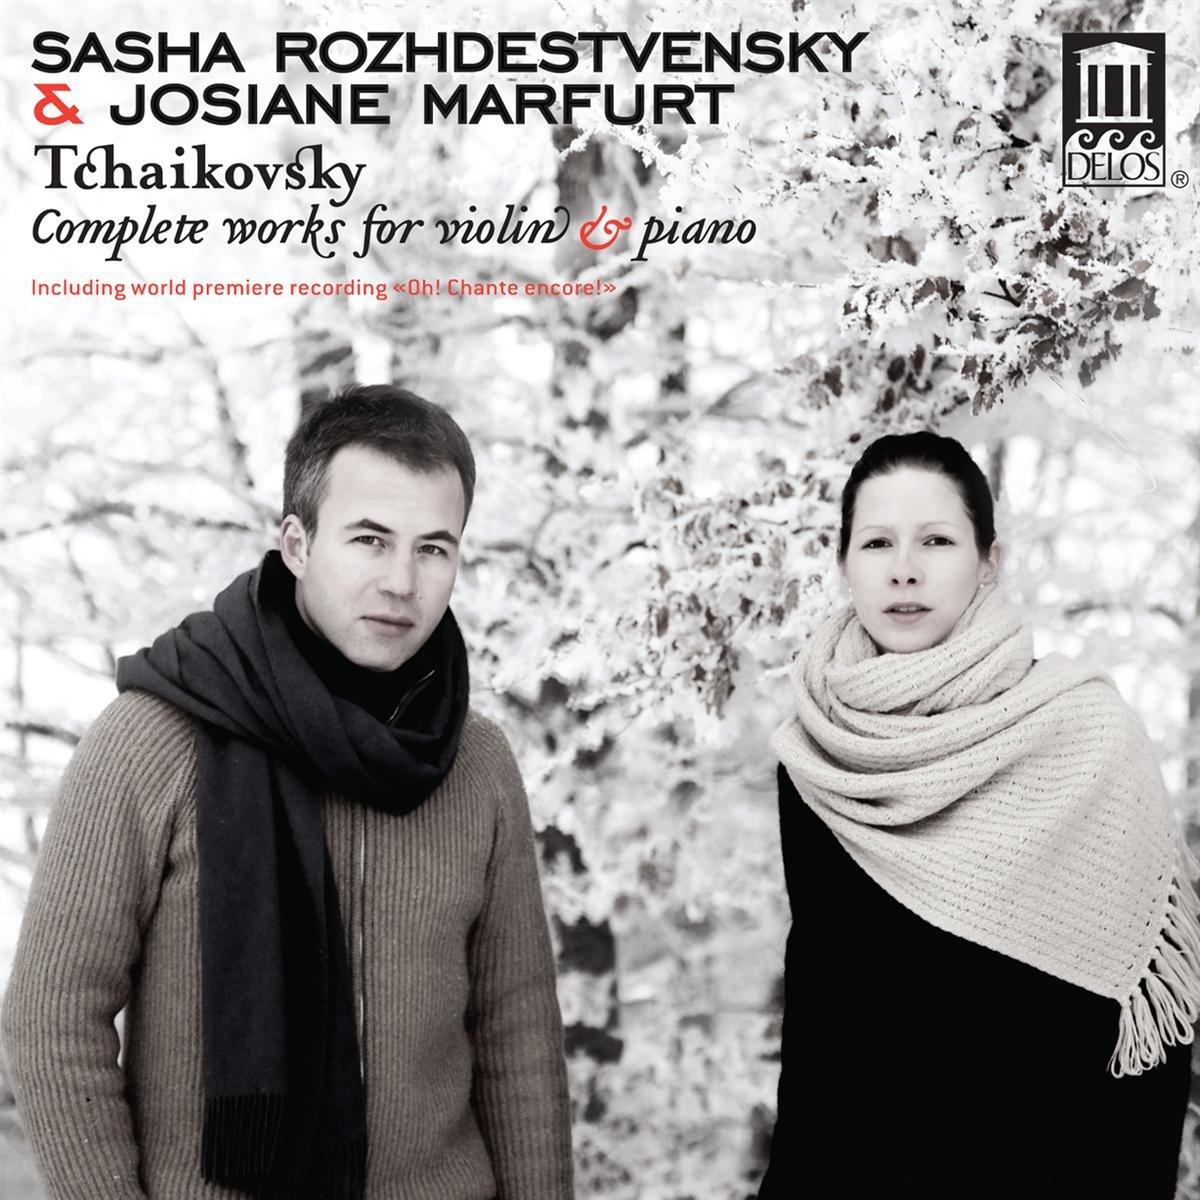 CD : Sasha Rozhdestvensky - Complete Works For Violin & Piano (CD)